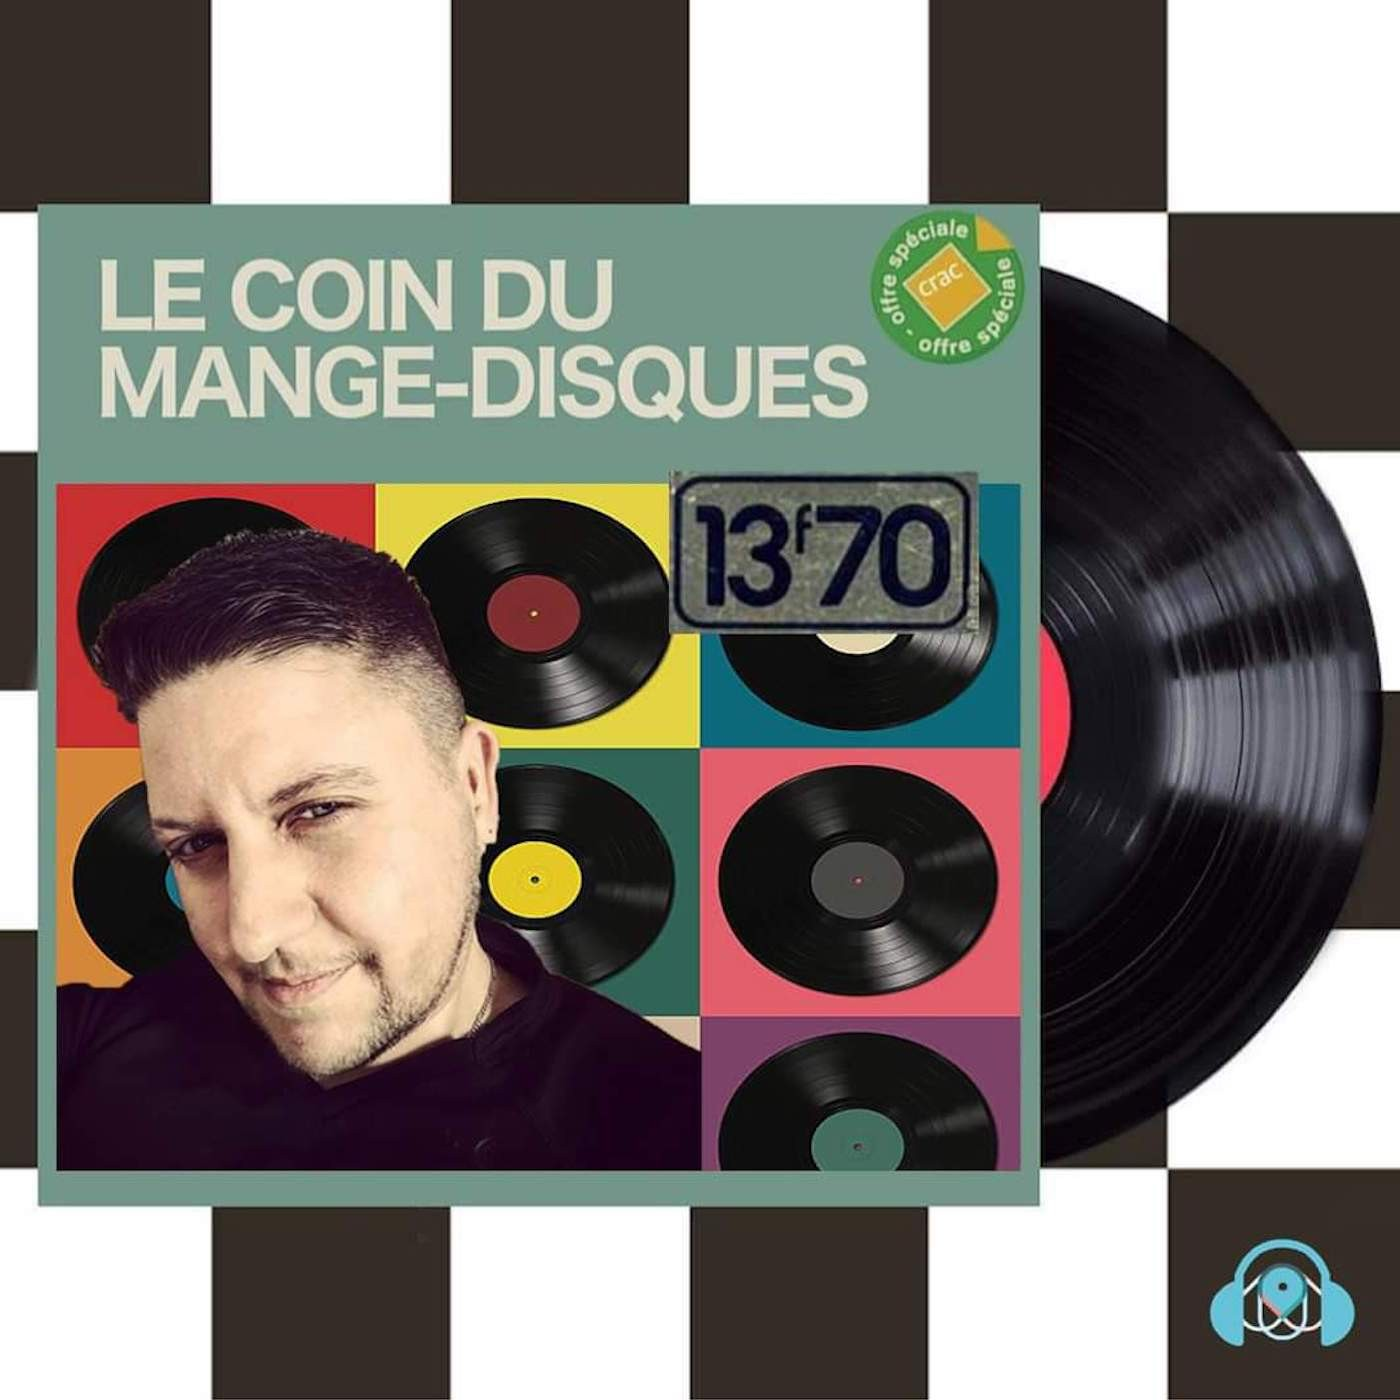 LE COIN DU MANGE-DISQUES S1E14 - Breizh Da Viken